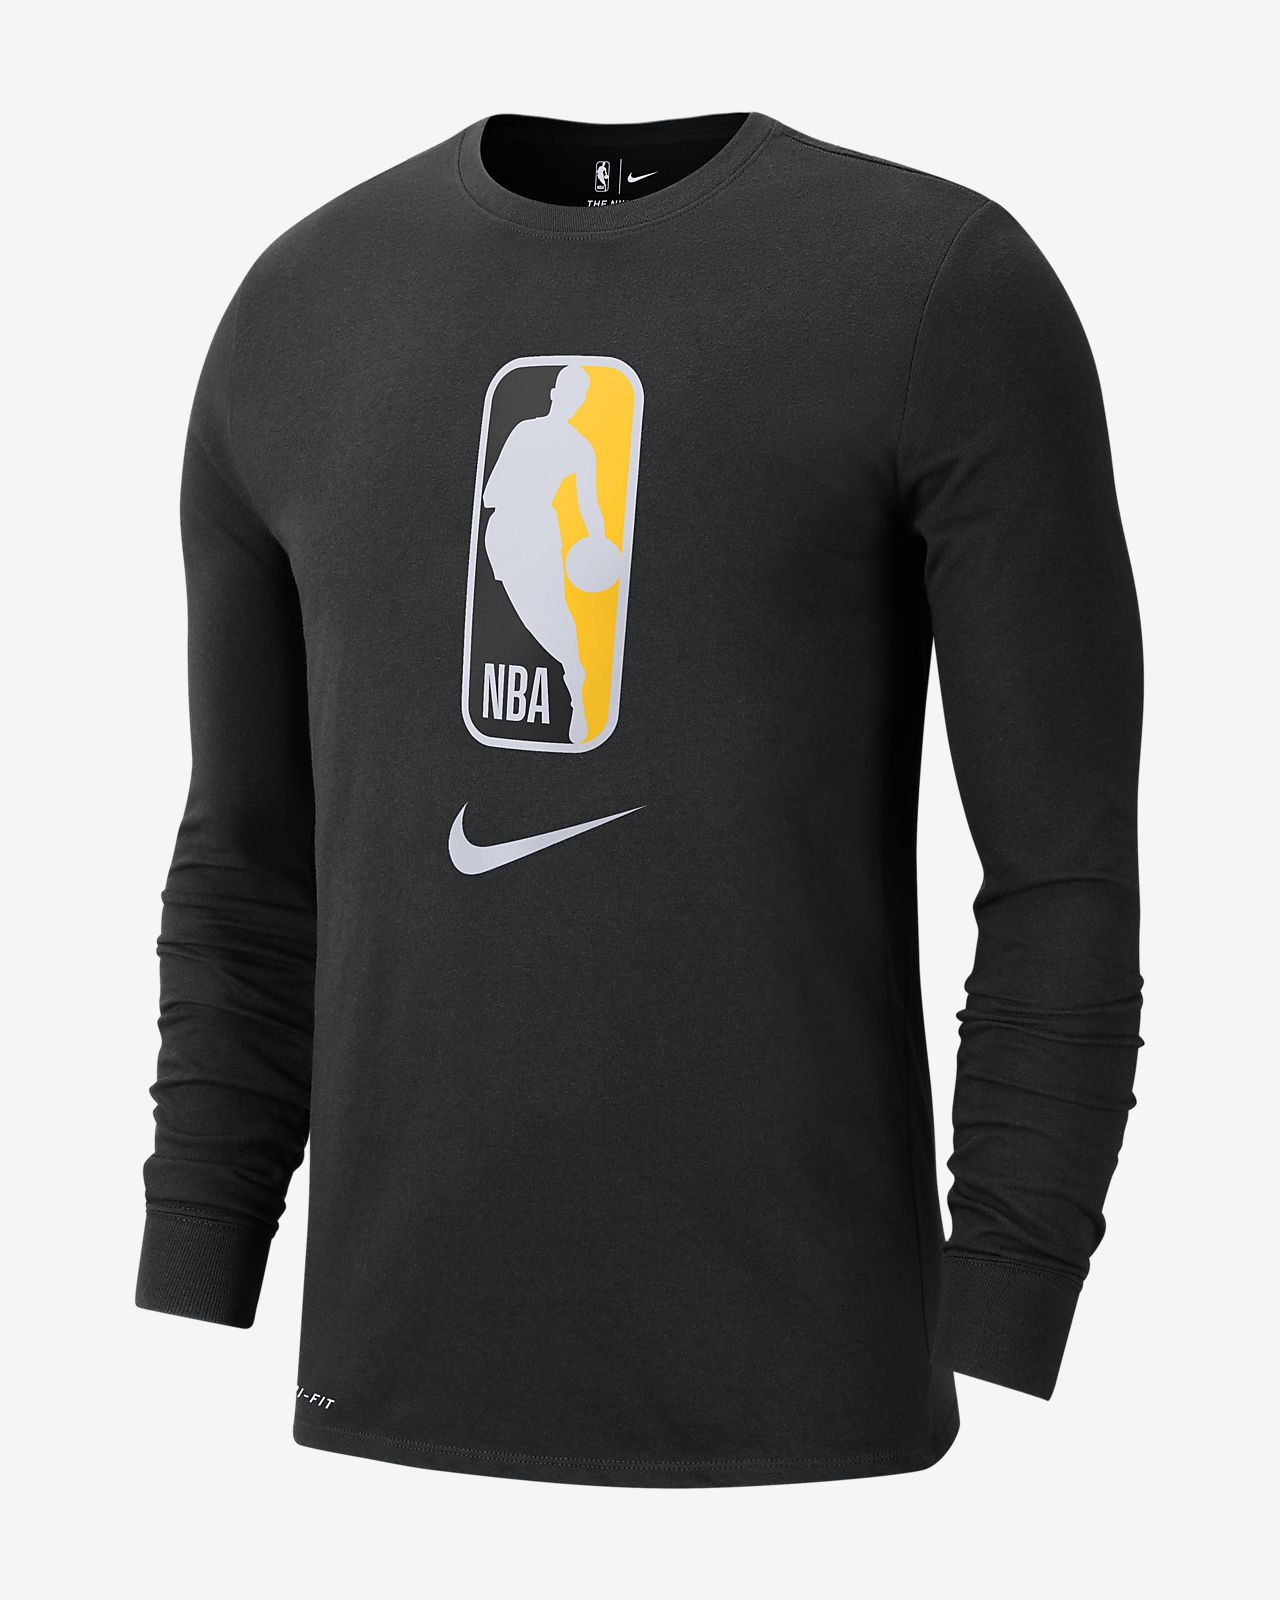 Nike Dri-FIT hosszú ujjú, NBA-s férfipóló